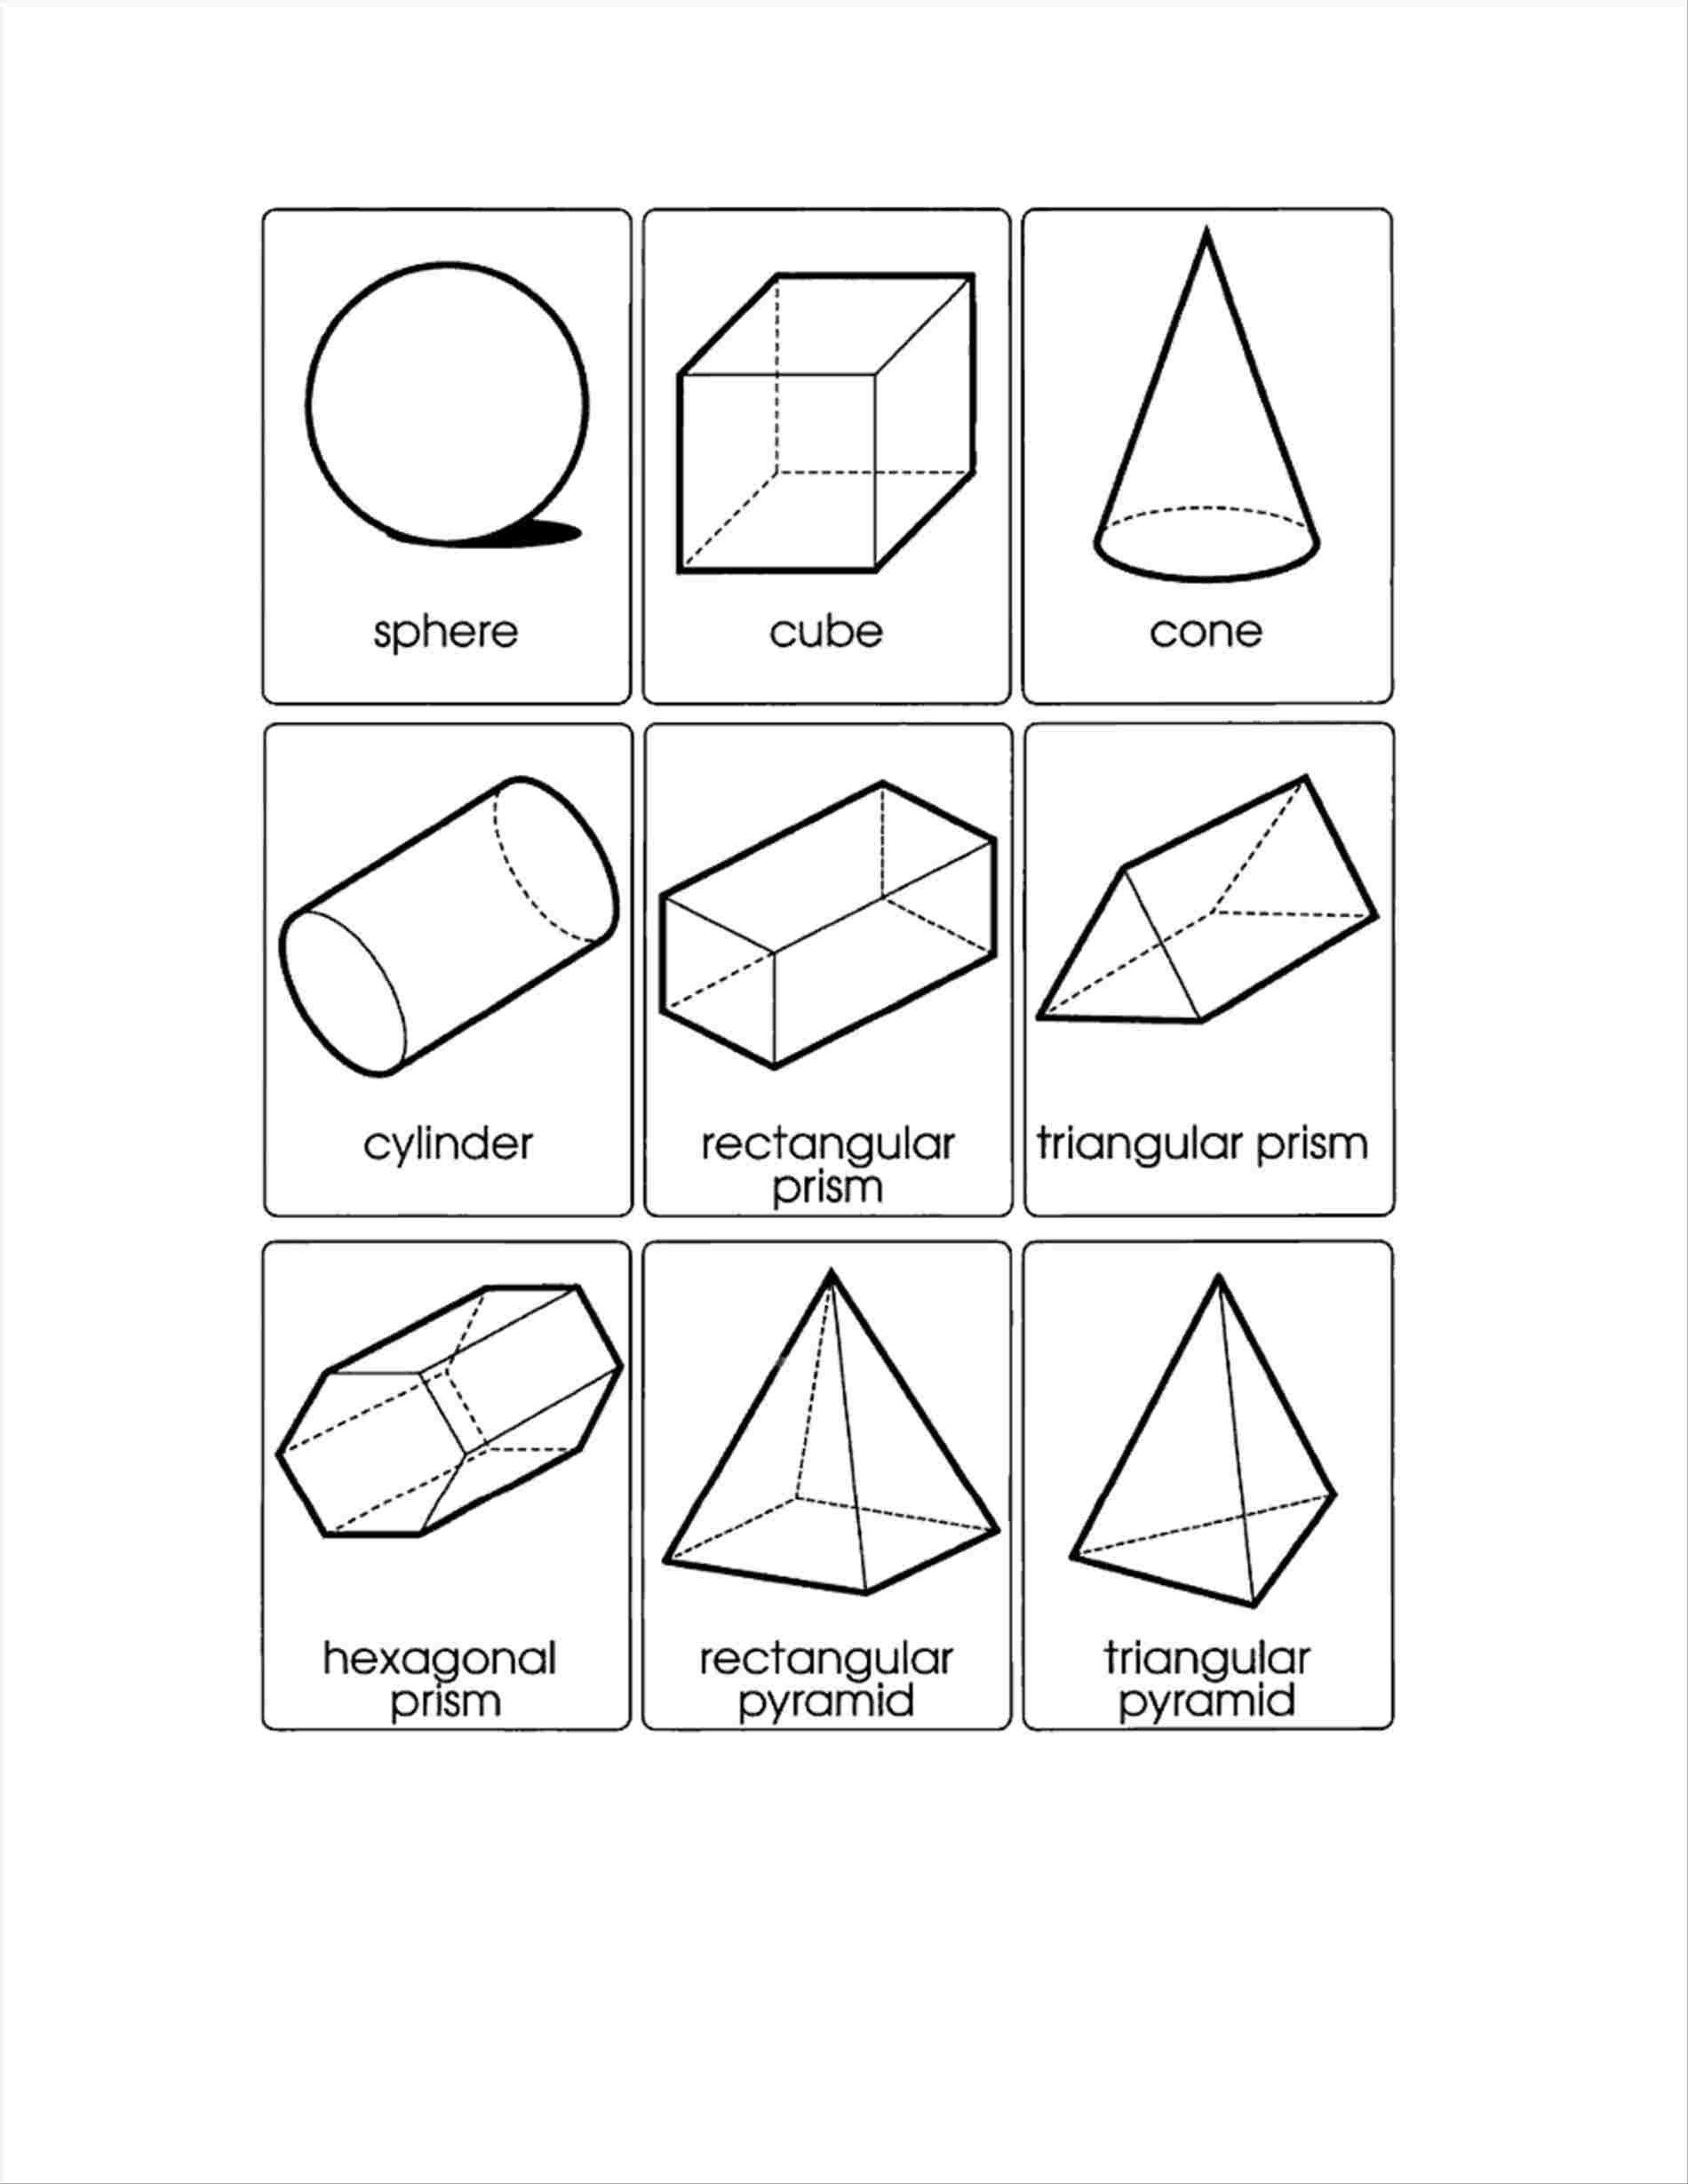 medium resolution of unique how to draw wire diagram wiringdiagram diagramming diagramm visuals visualisation graphical